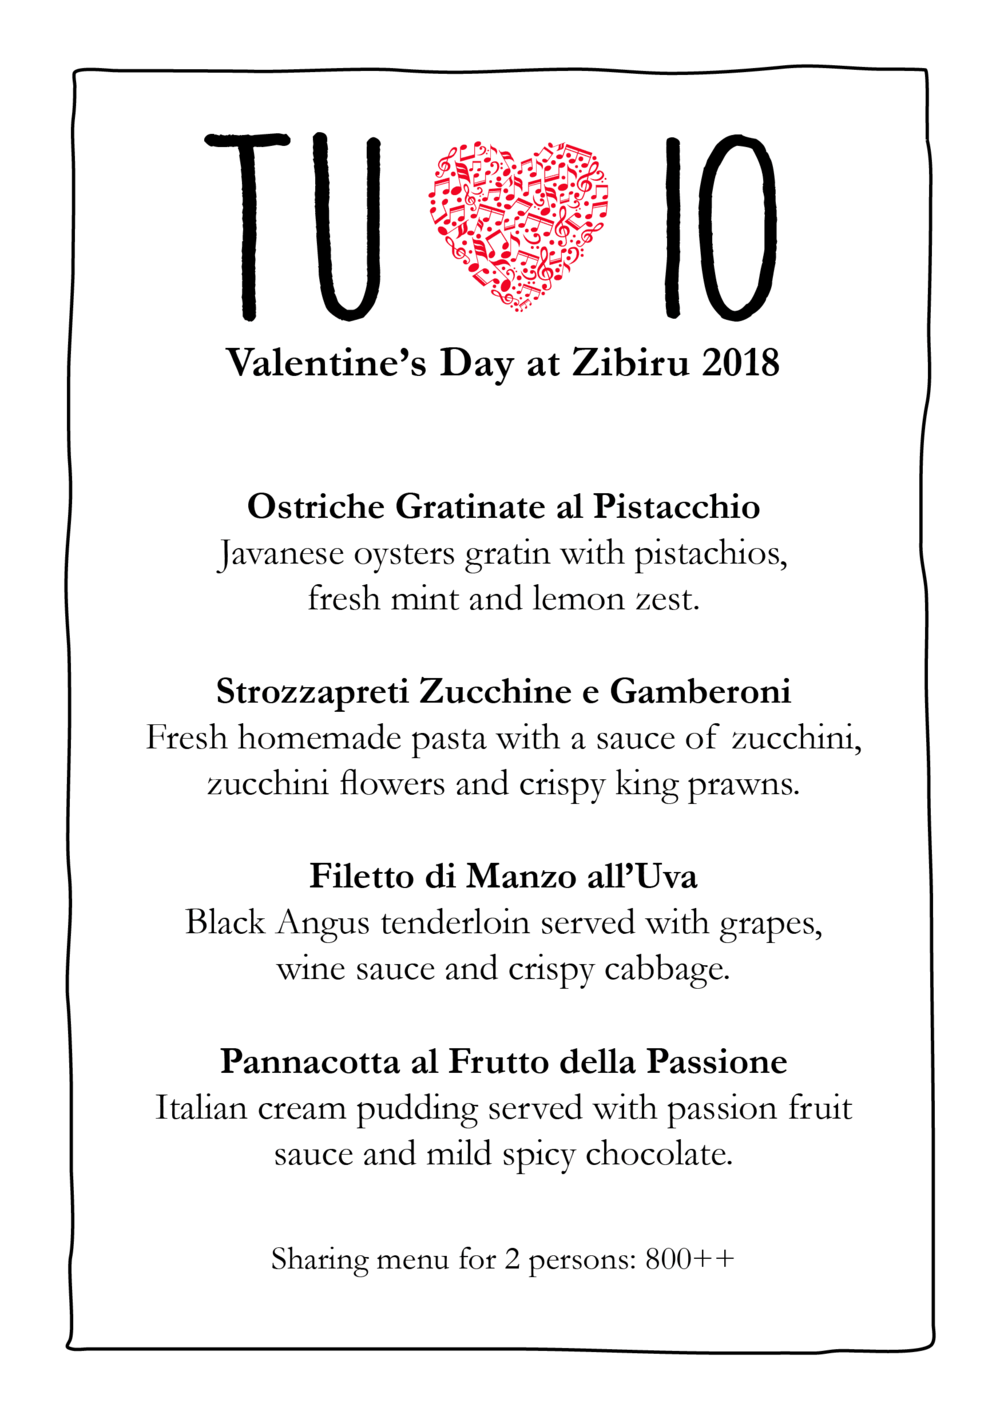 zibiru-italian-restaurant-tu-io-valentines-day-2018-set-menu.png